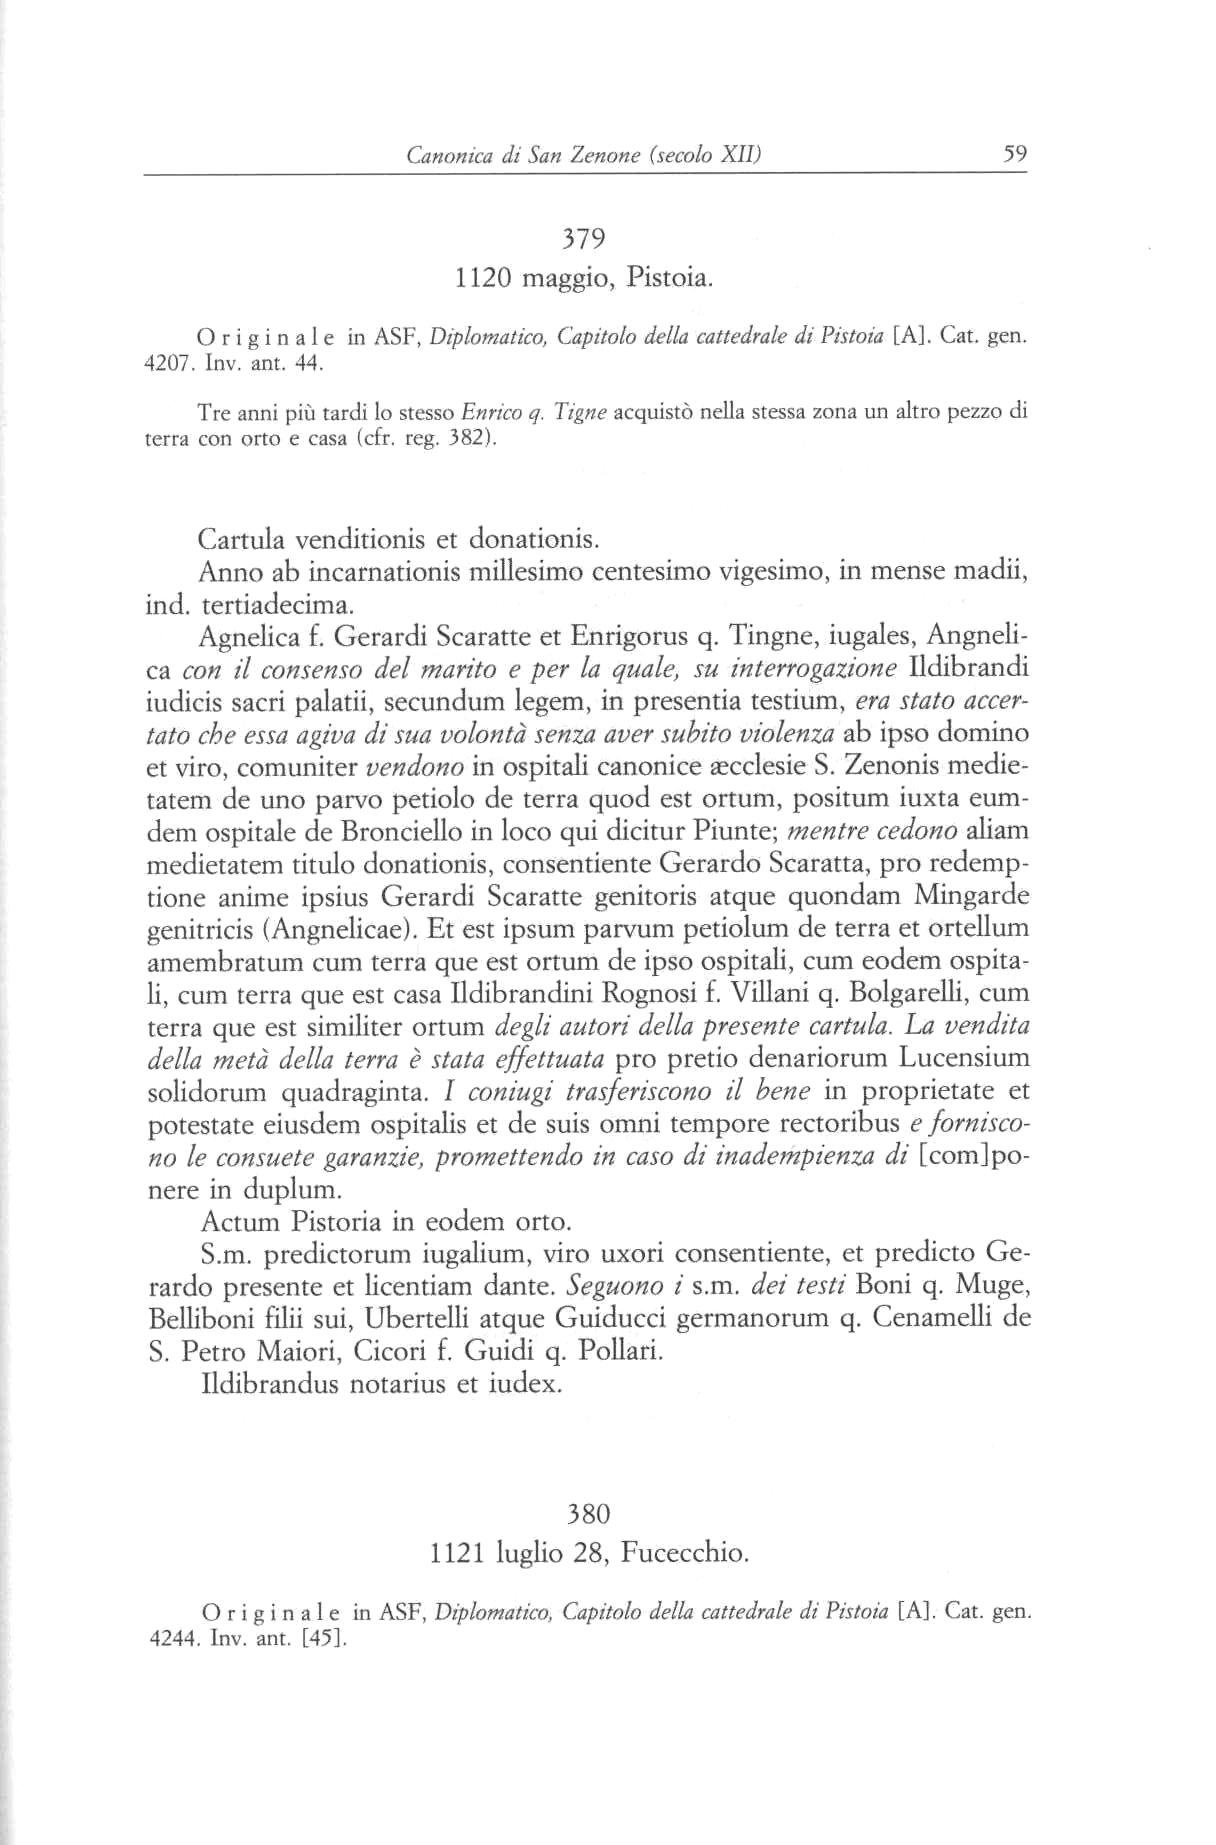 Canonica S. Zenone XII 0059.jpg